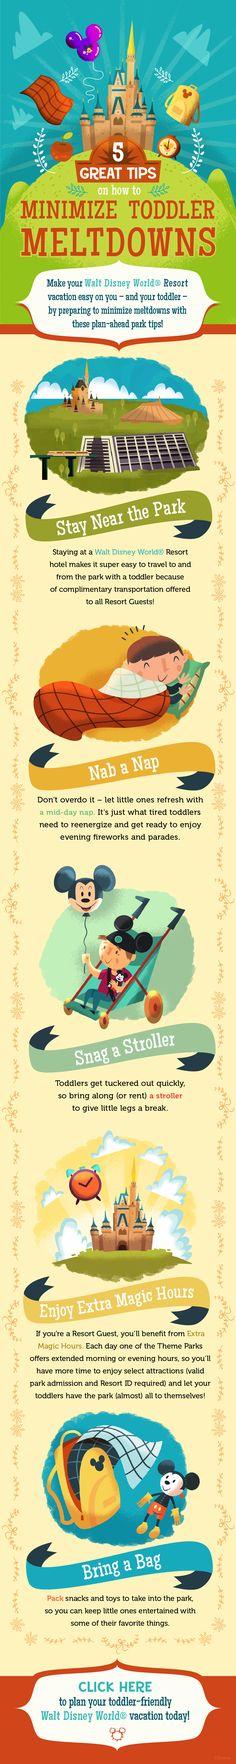 5 tips to minimize toddler meltdowns at Walt Disney World! #vacation #tricks